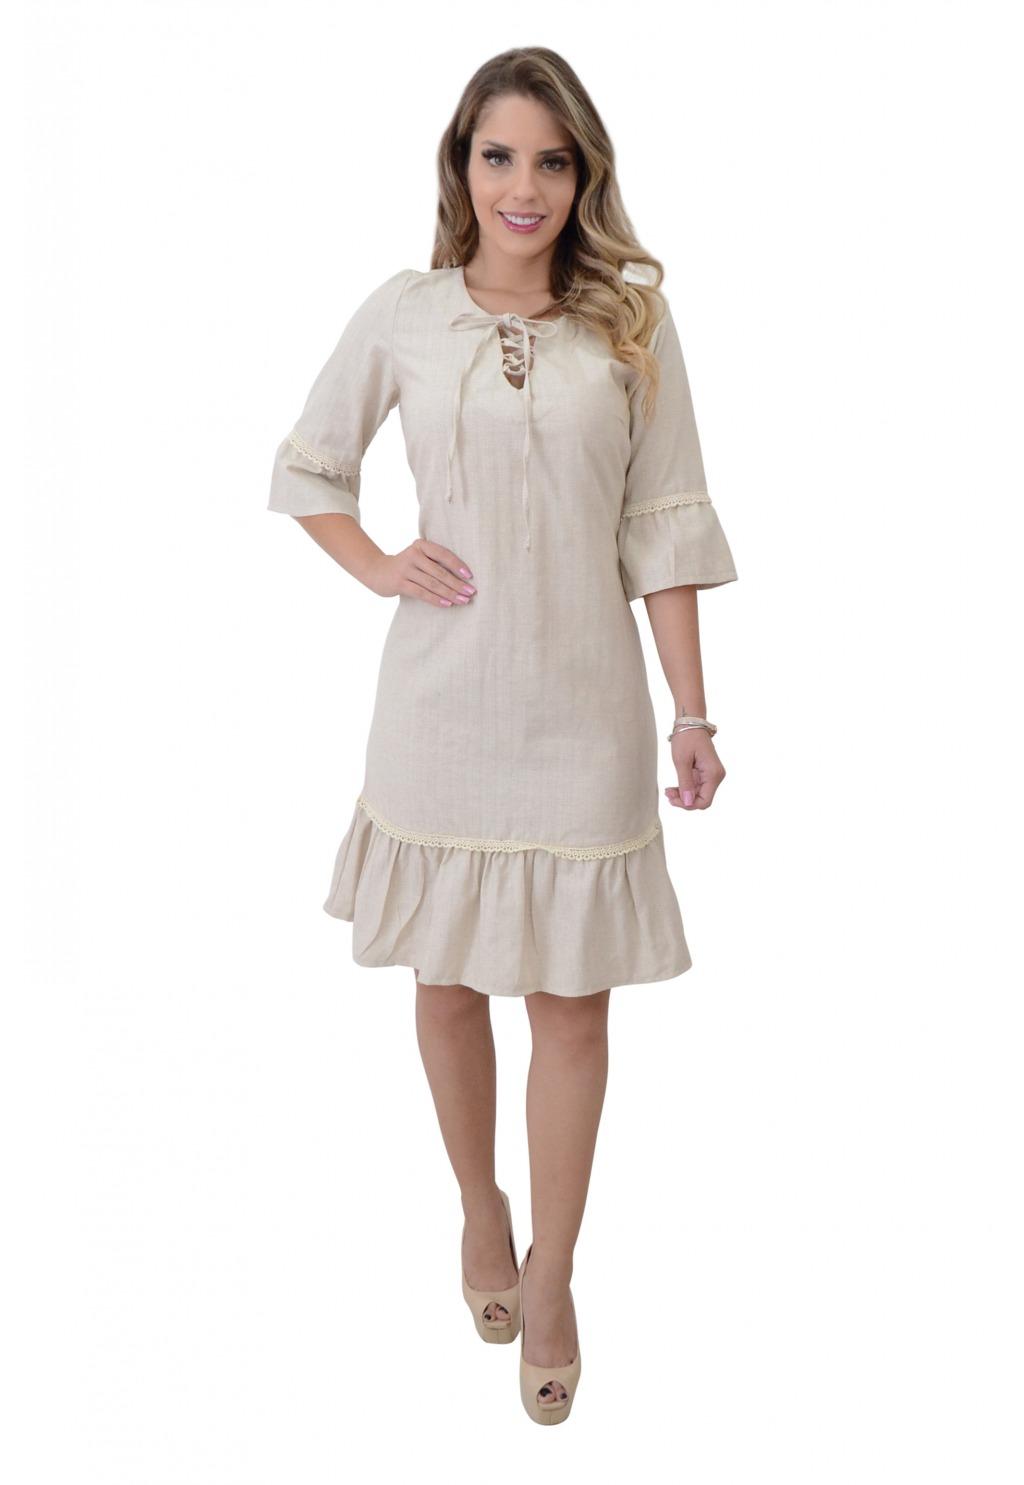 Vestido Mamorena opeplum com rendinha